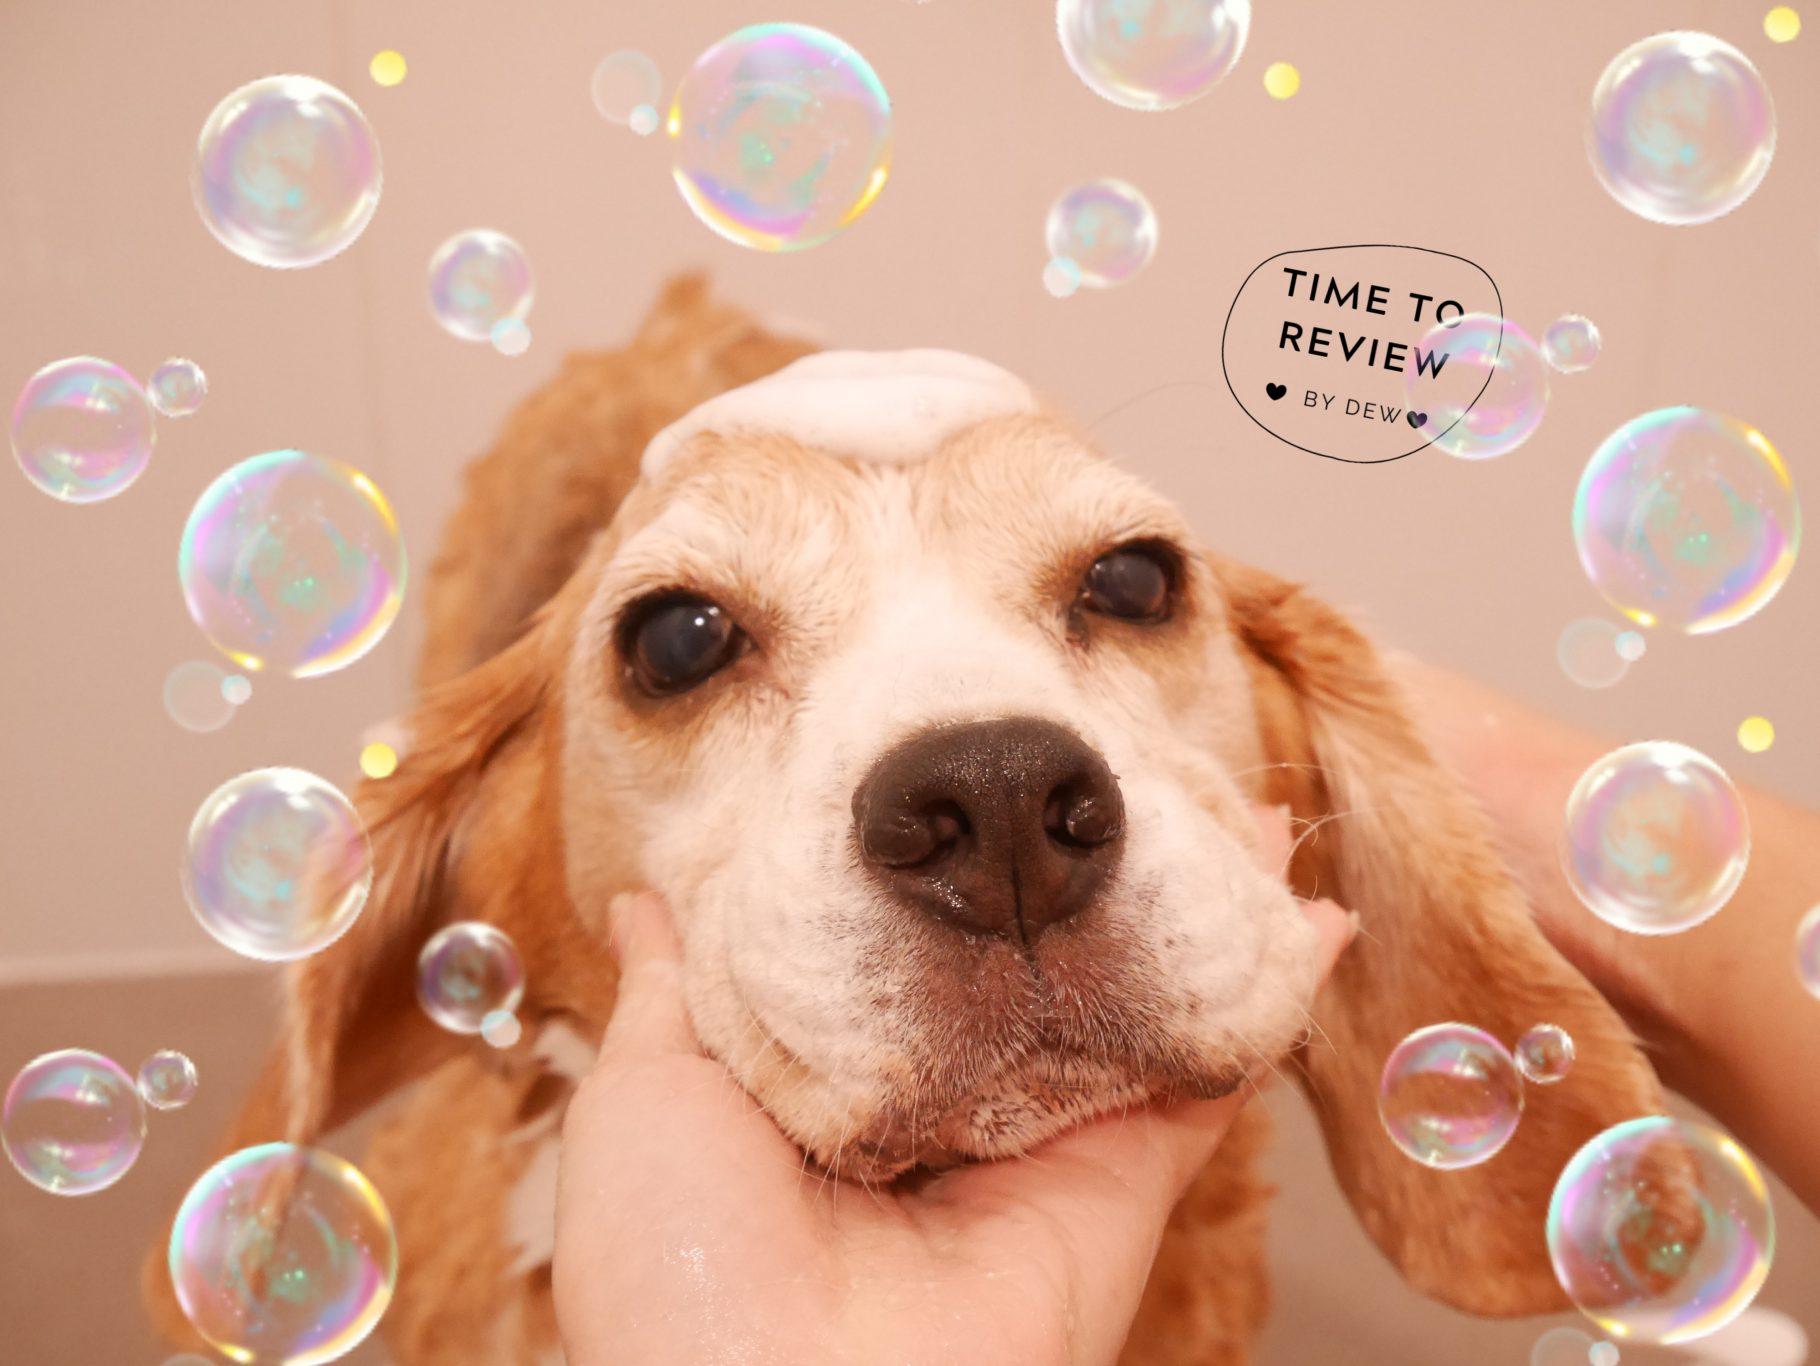 [Review] St.Harry แชมพูสุนัขสูตรอ่อนโยนจากธรรมชาติ